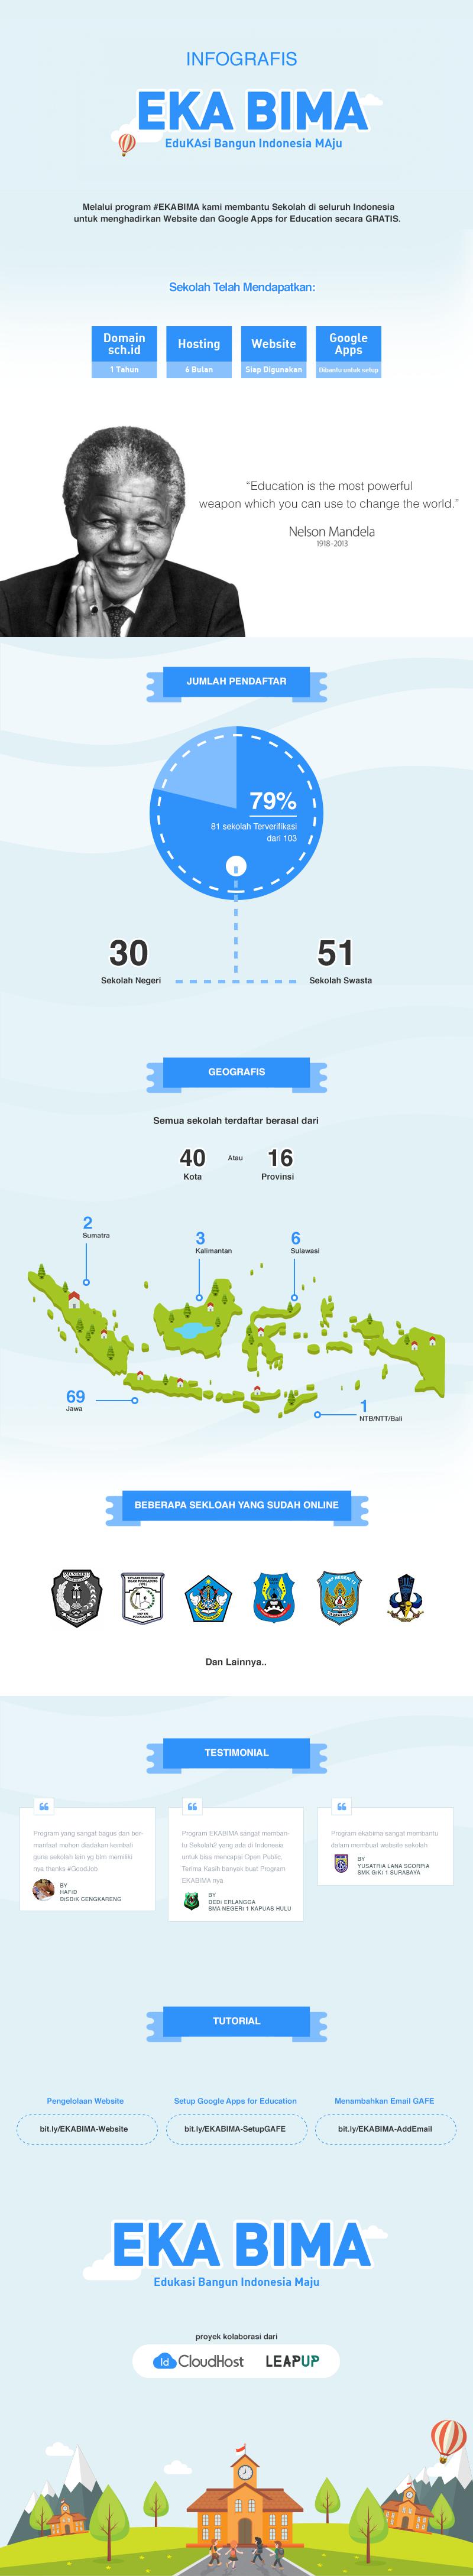 Infografis ekabima - IDCloudHost LeapUp